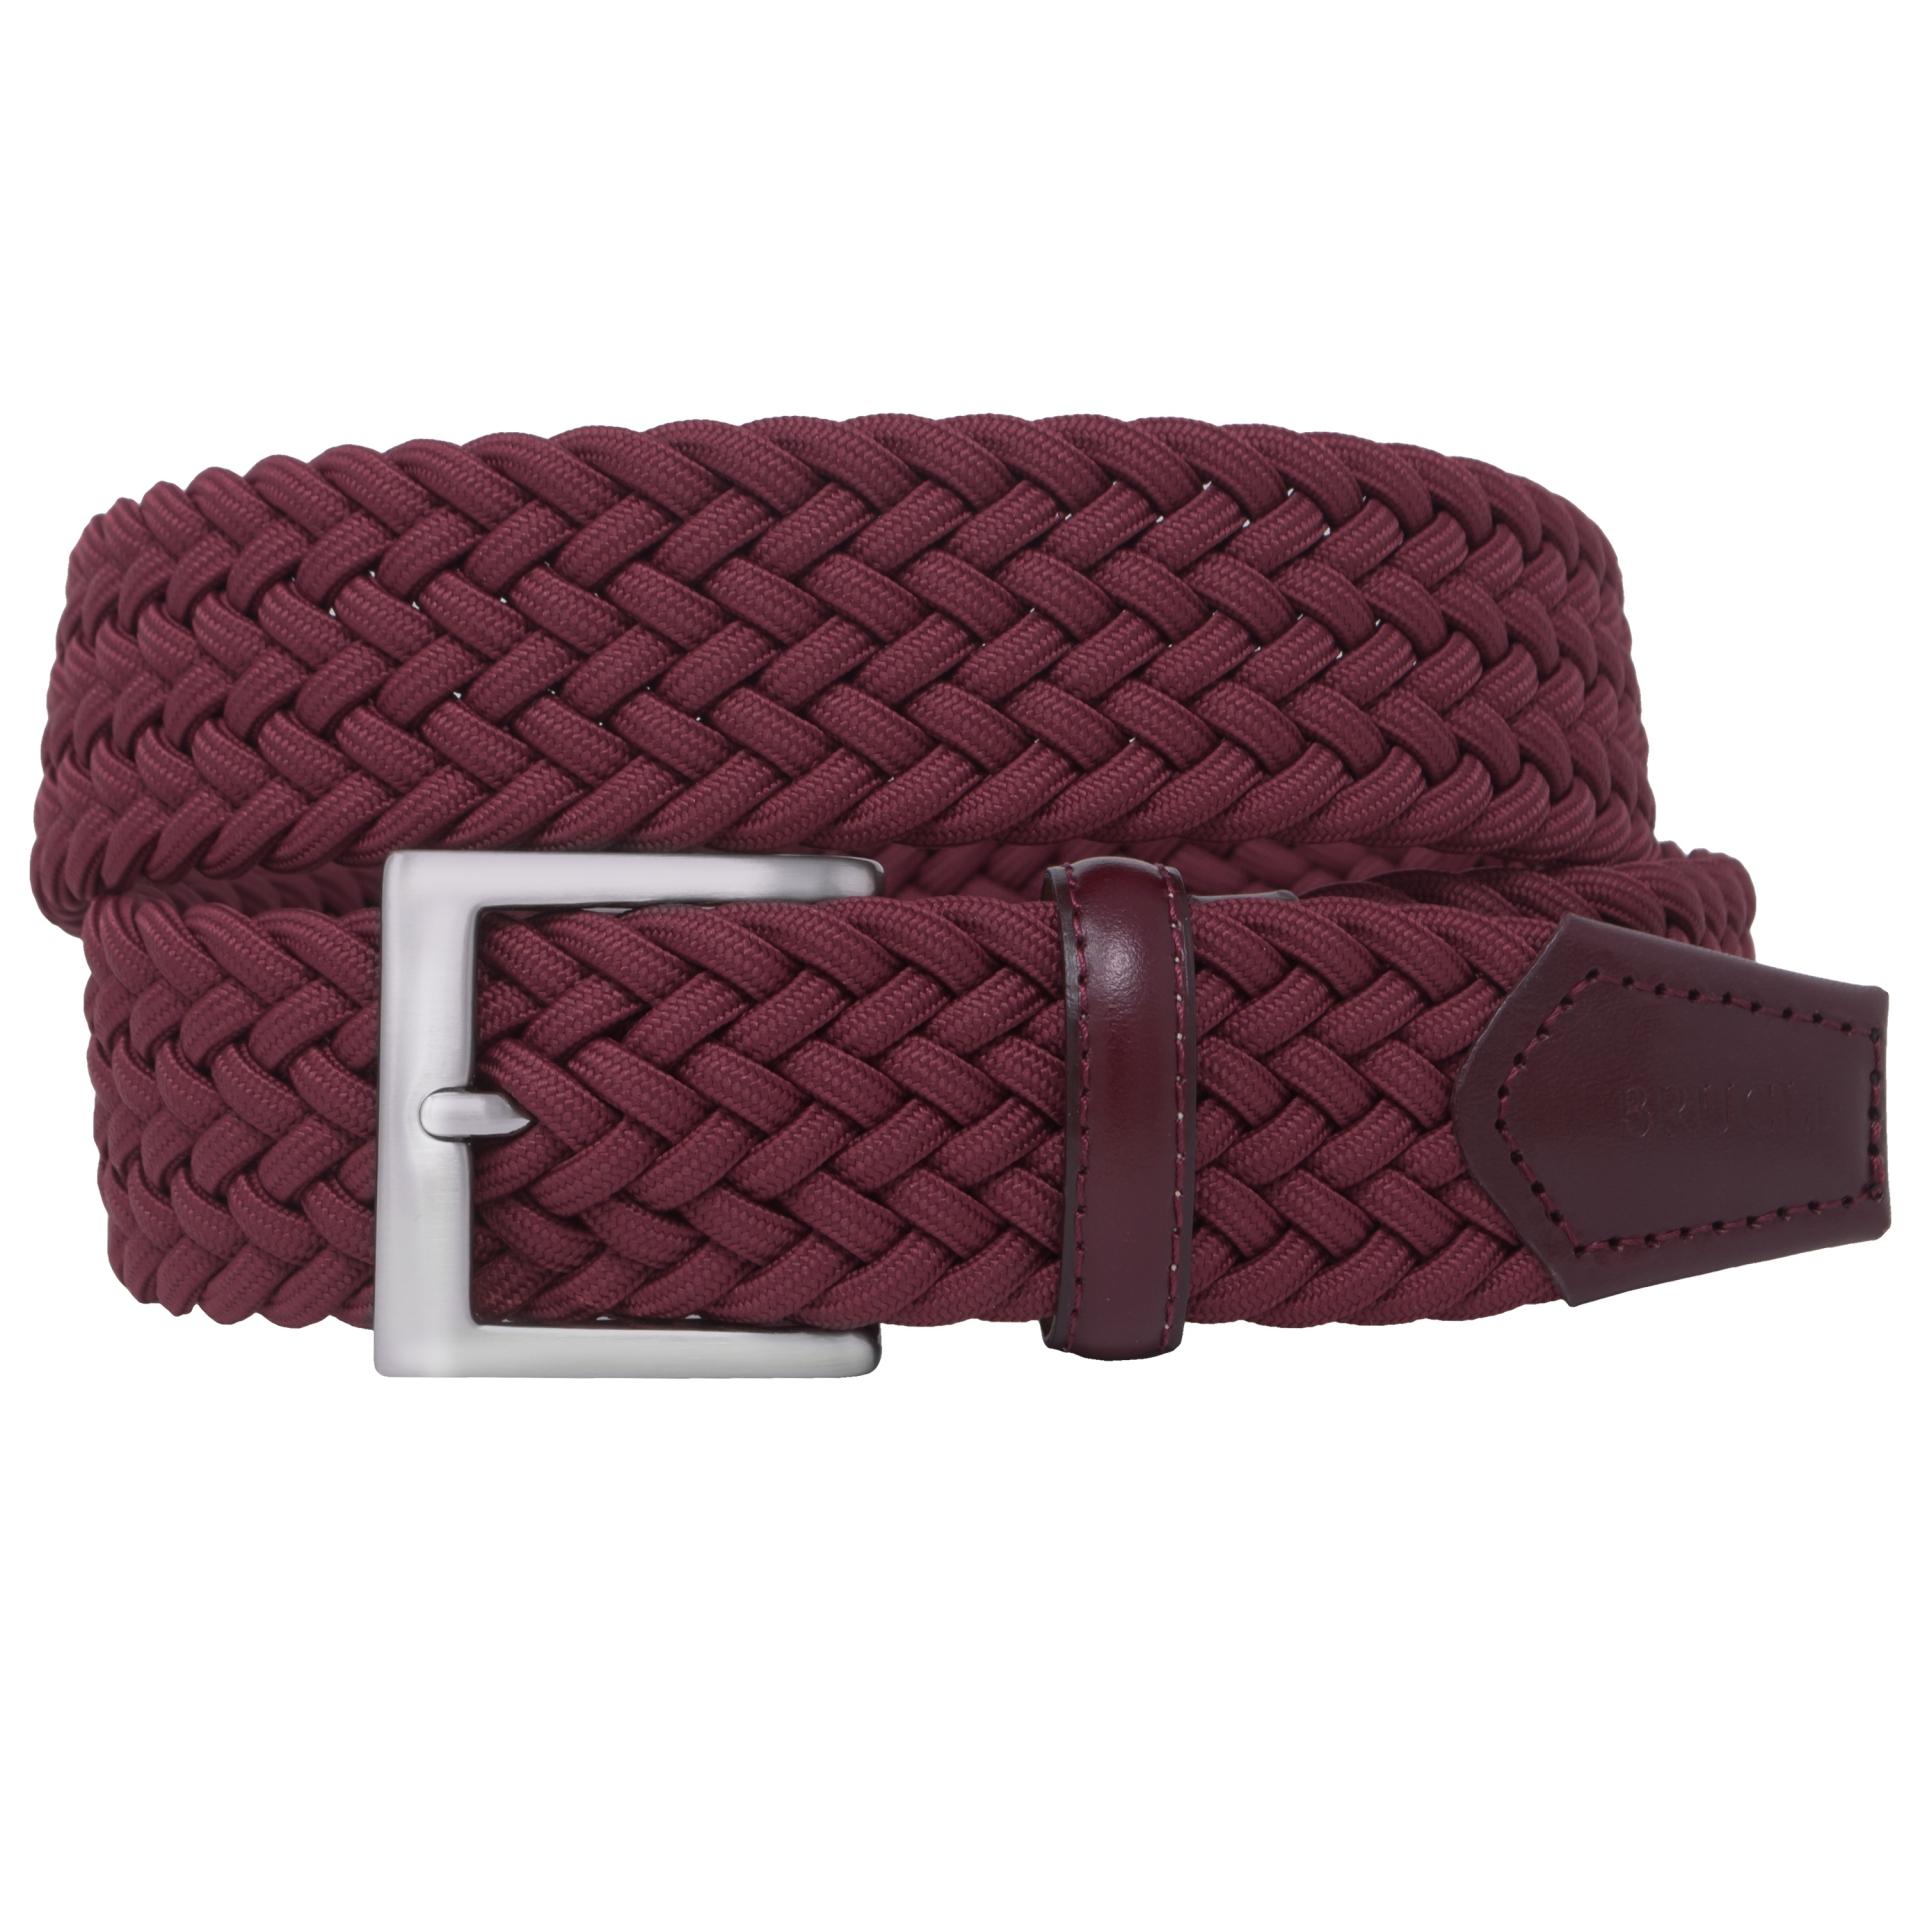 elastic braided belt bordeaux